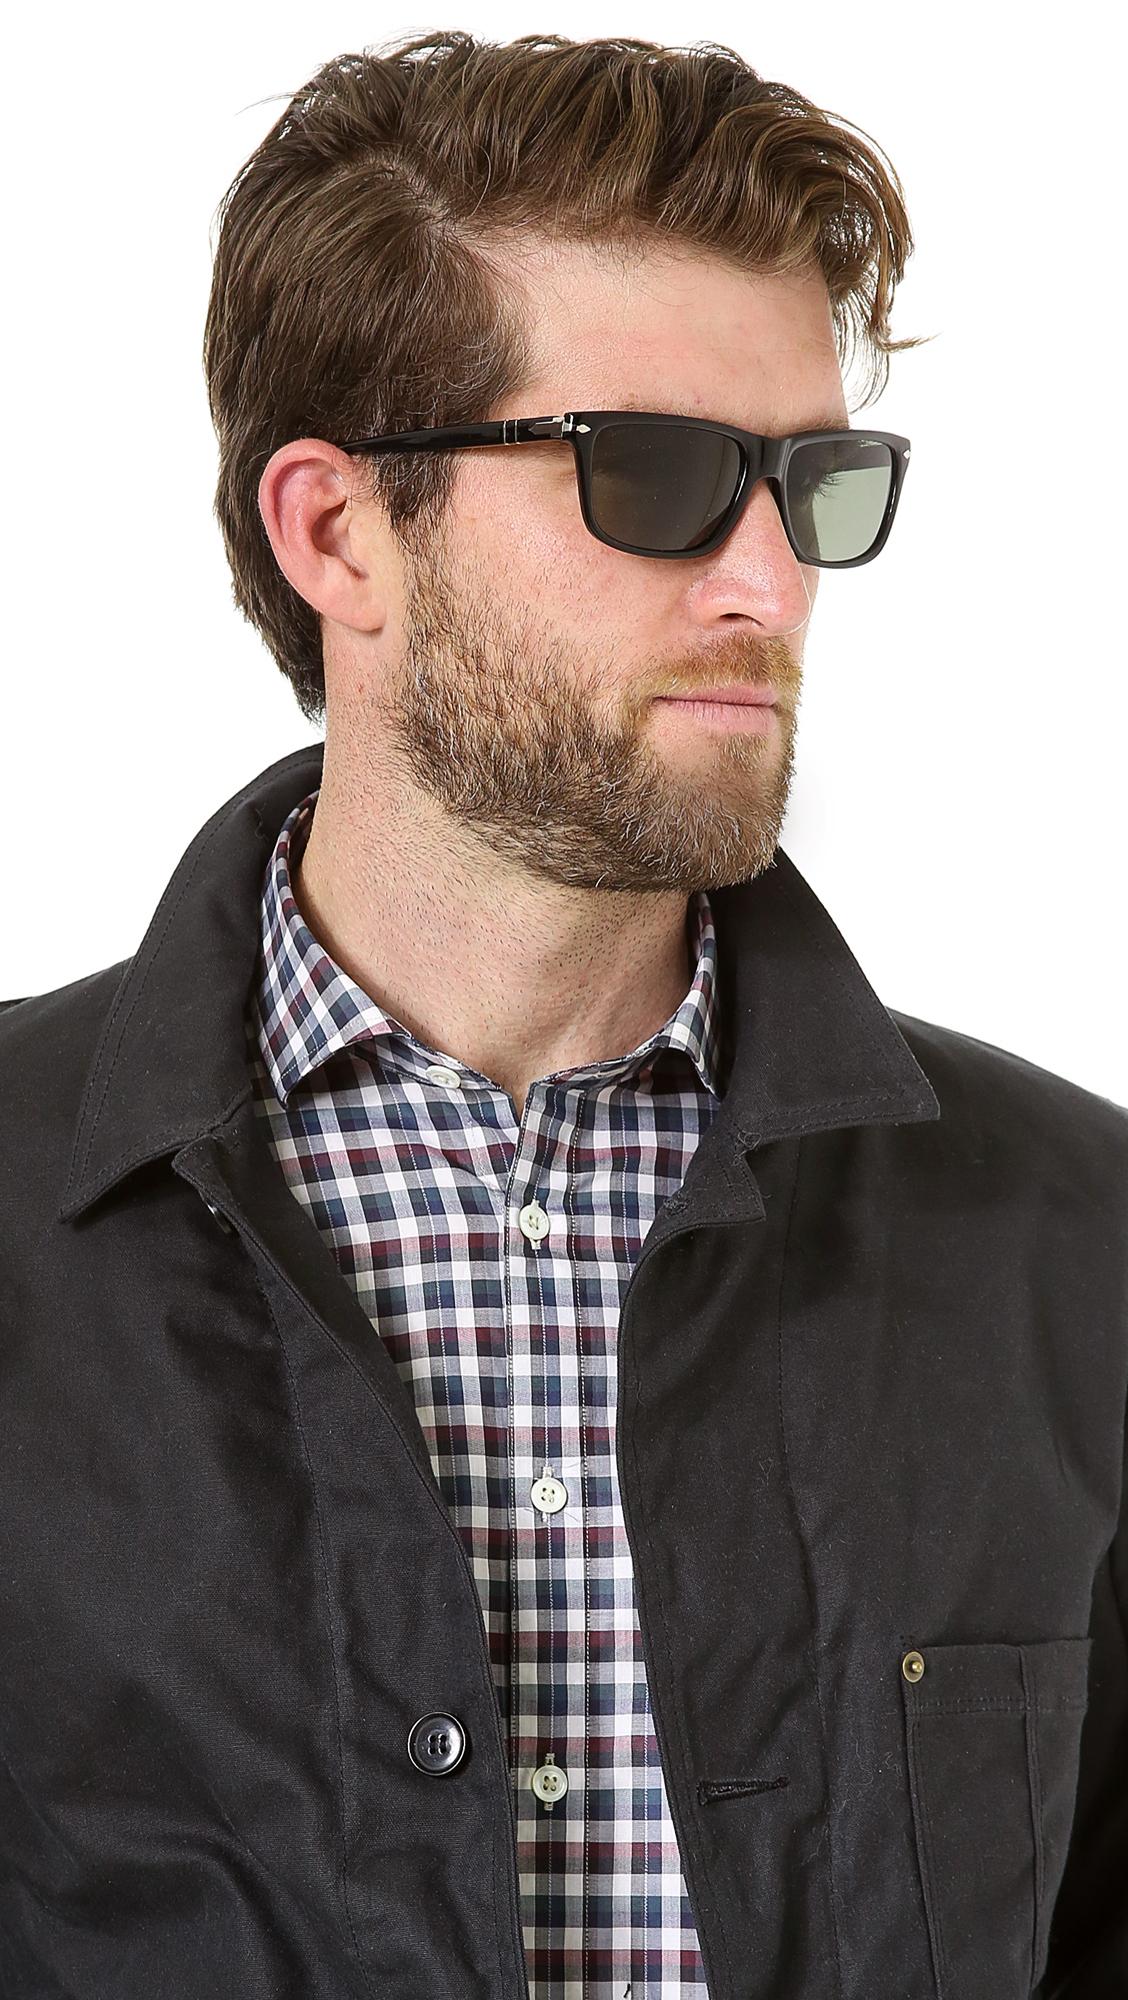 55636223e9 Lyst - Persol Rectangular Polarized Sunglasses in Black for Men